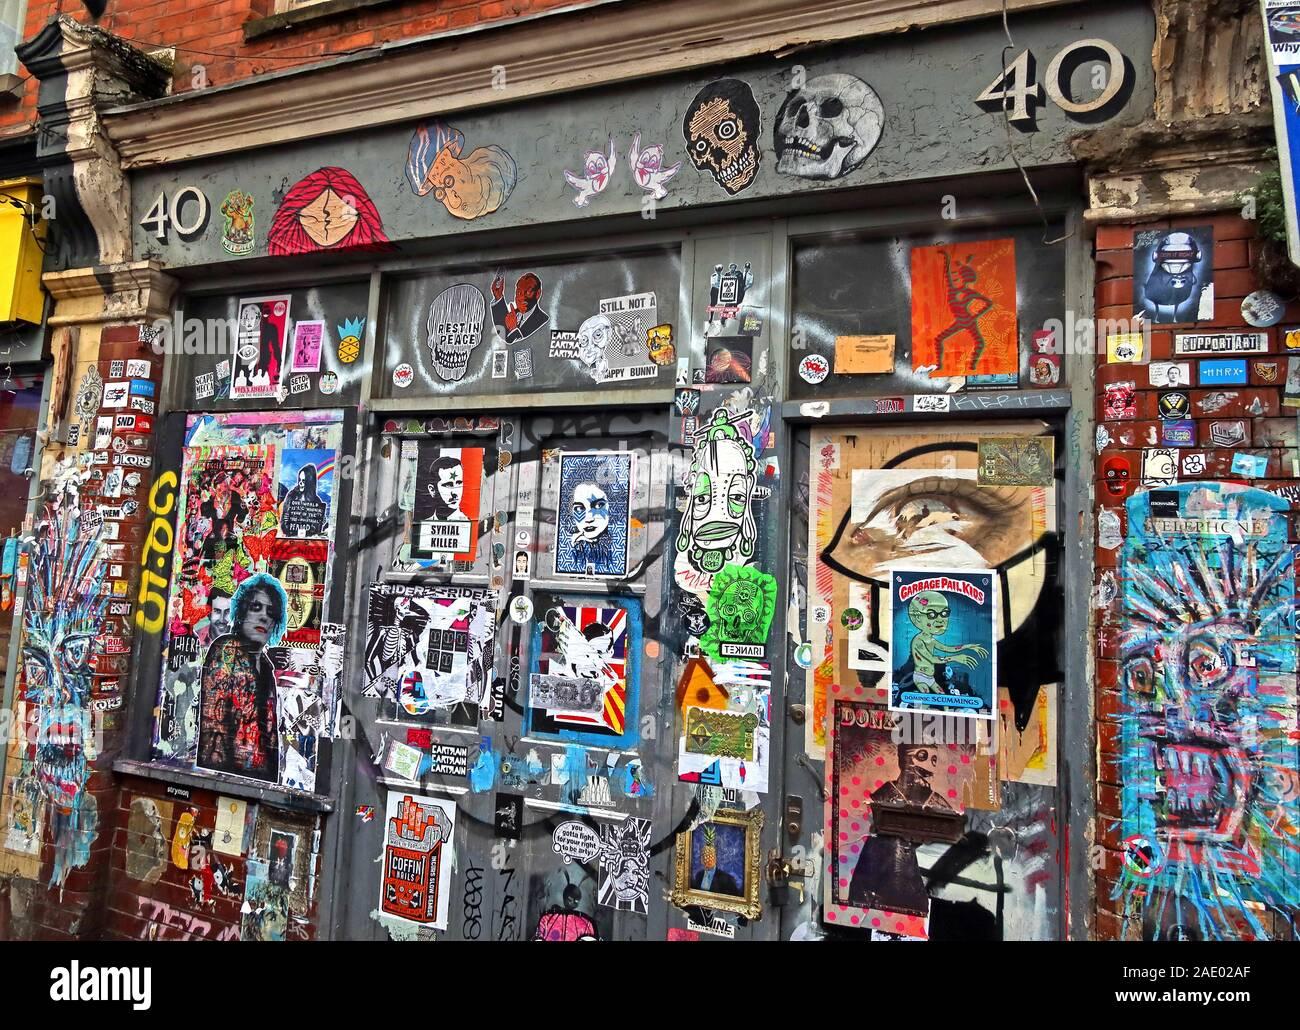 @Hotpixuk,HotpixUK,GoTonySmith,UK,England,grafitti,artist,stencil,stencils,London,E1,BrickLane,Tower Hamlets